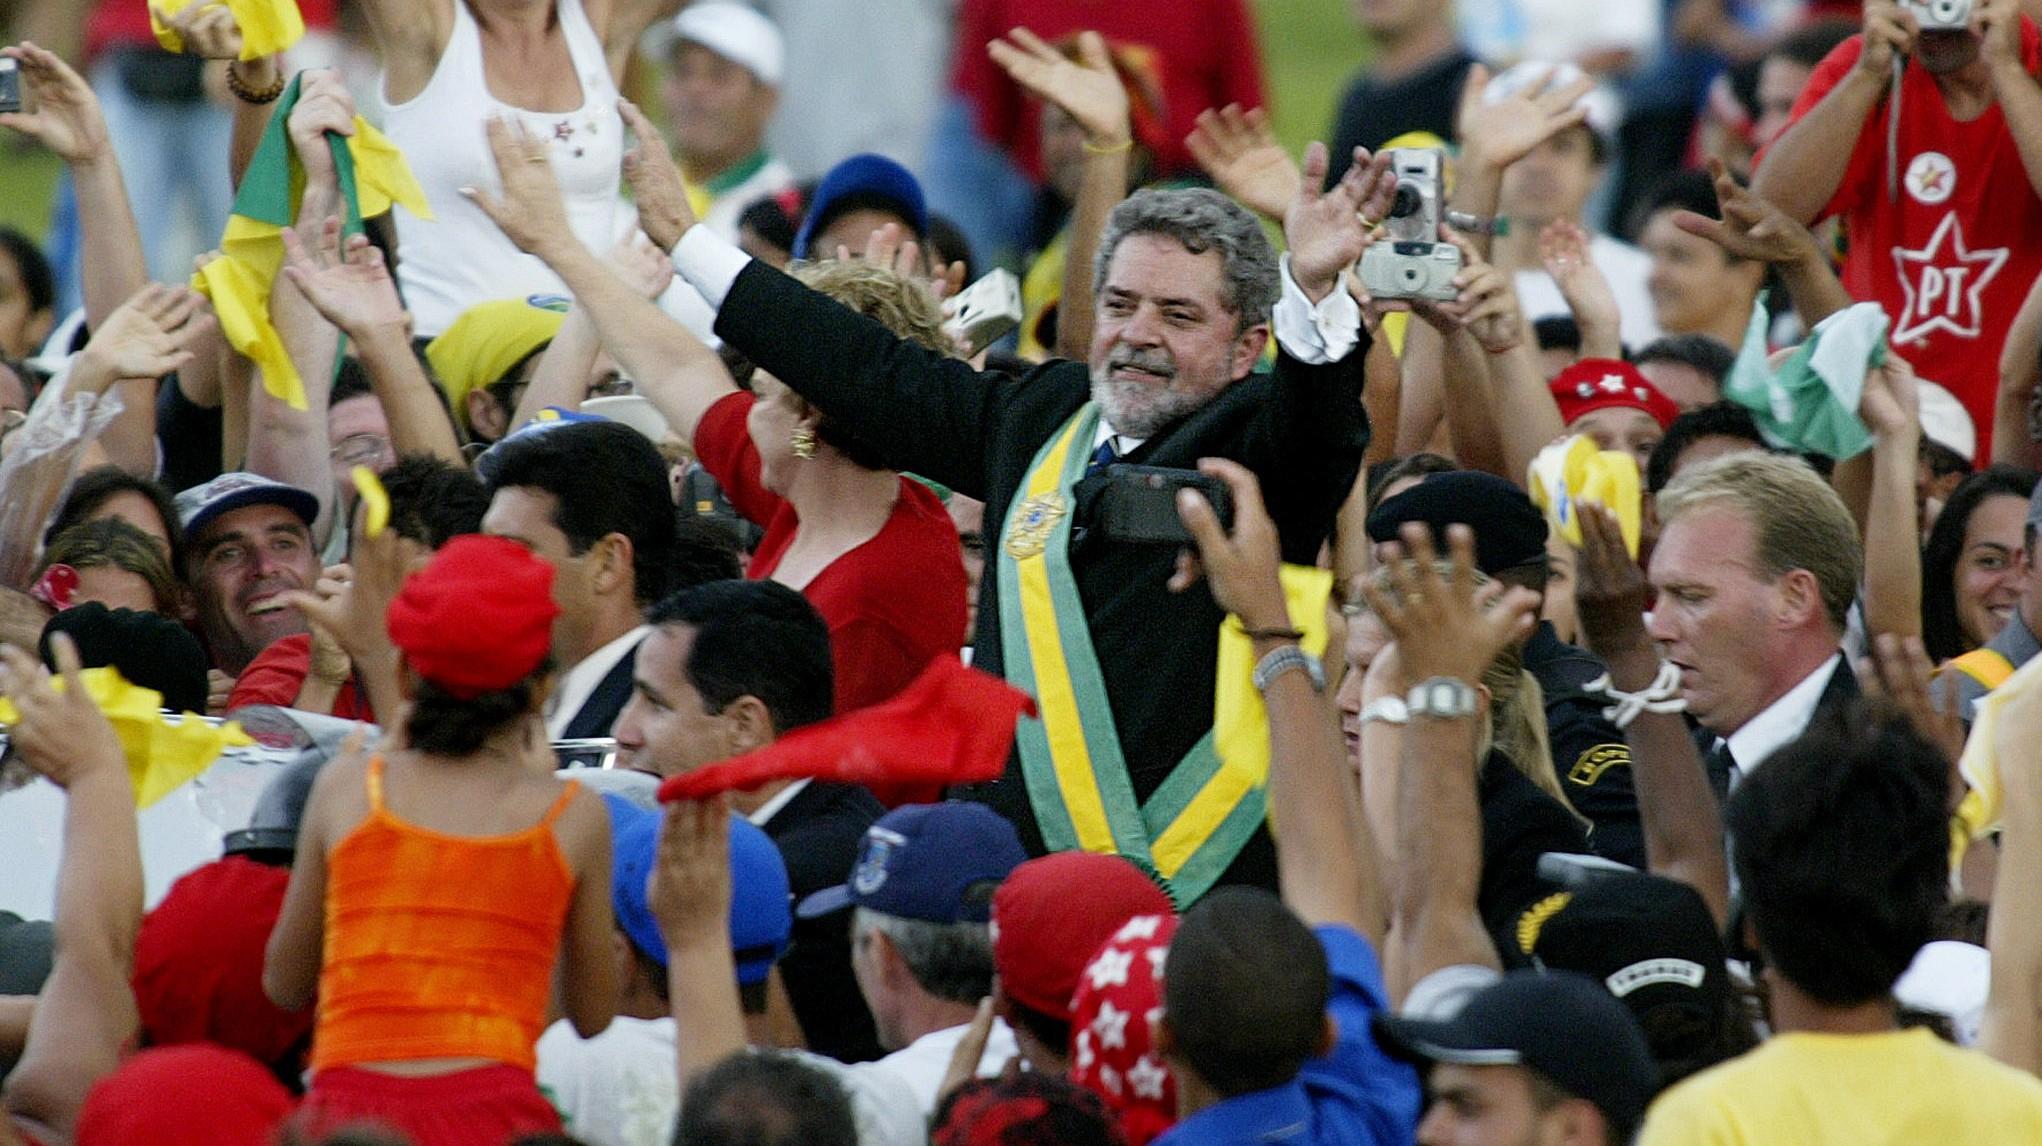 NEW BRAZILIAN PRESIDENT LULA RIDES THROUGH THOUSANDS OF FOLLOWERS.